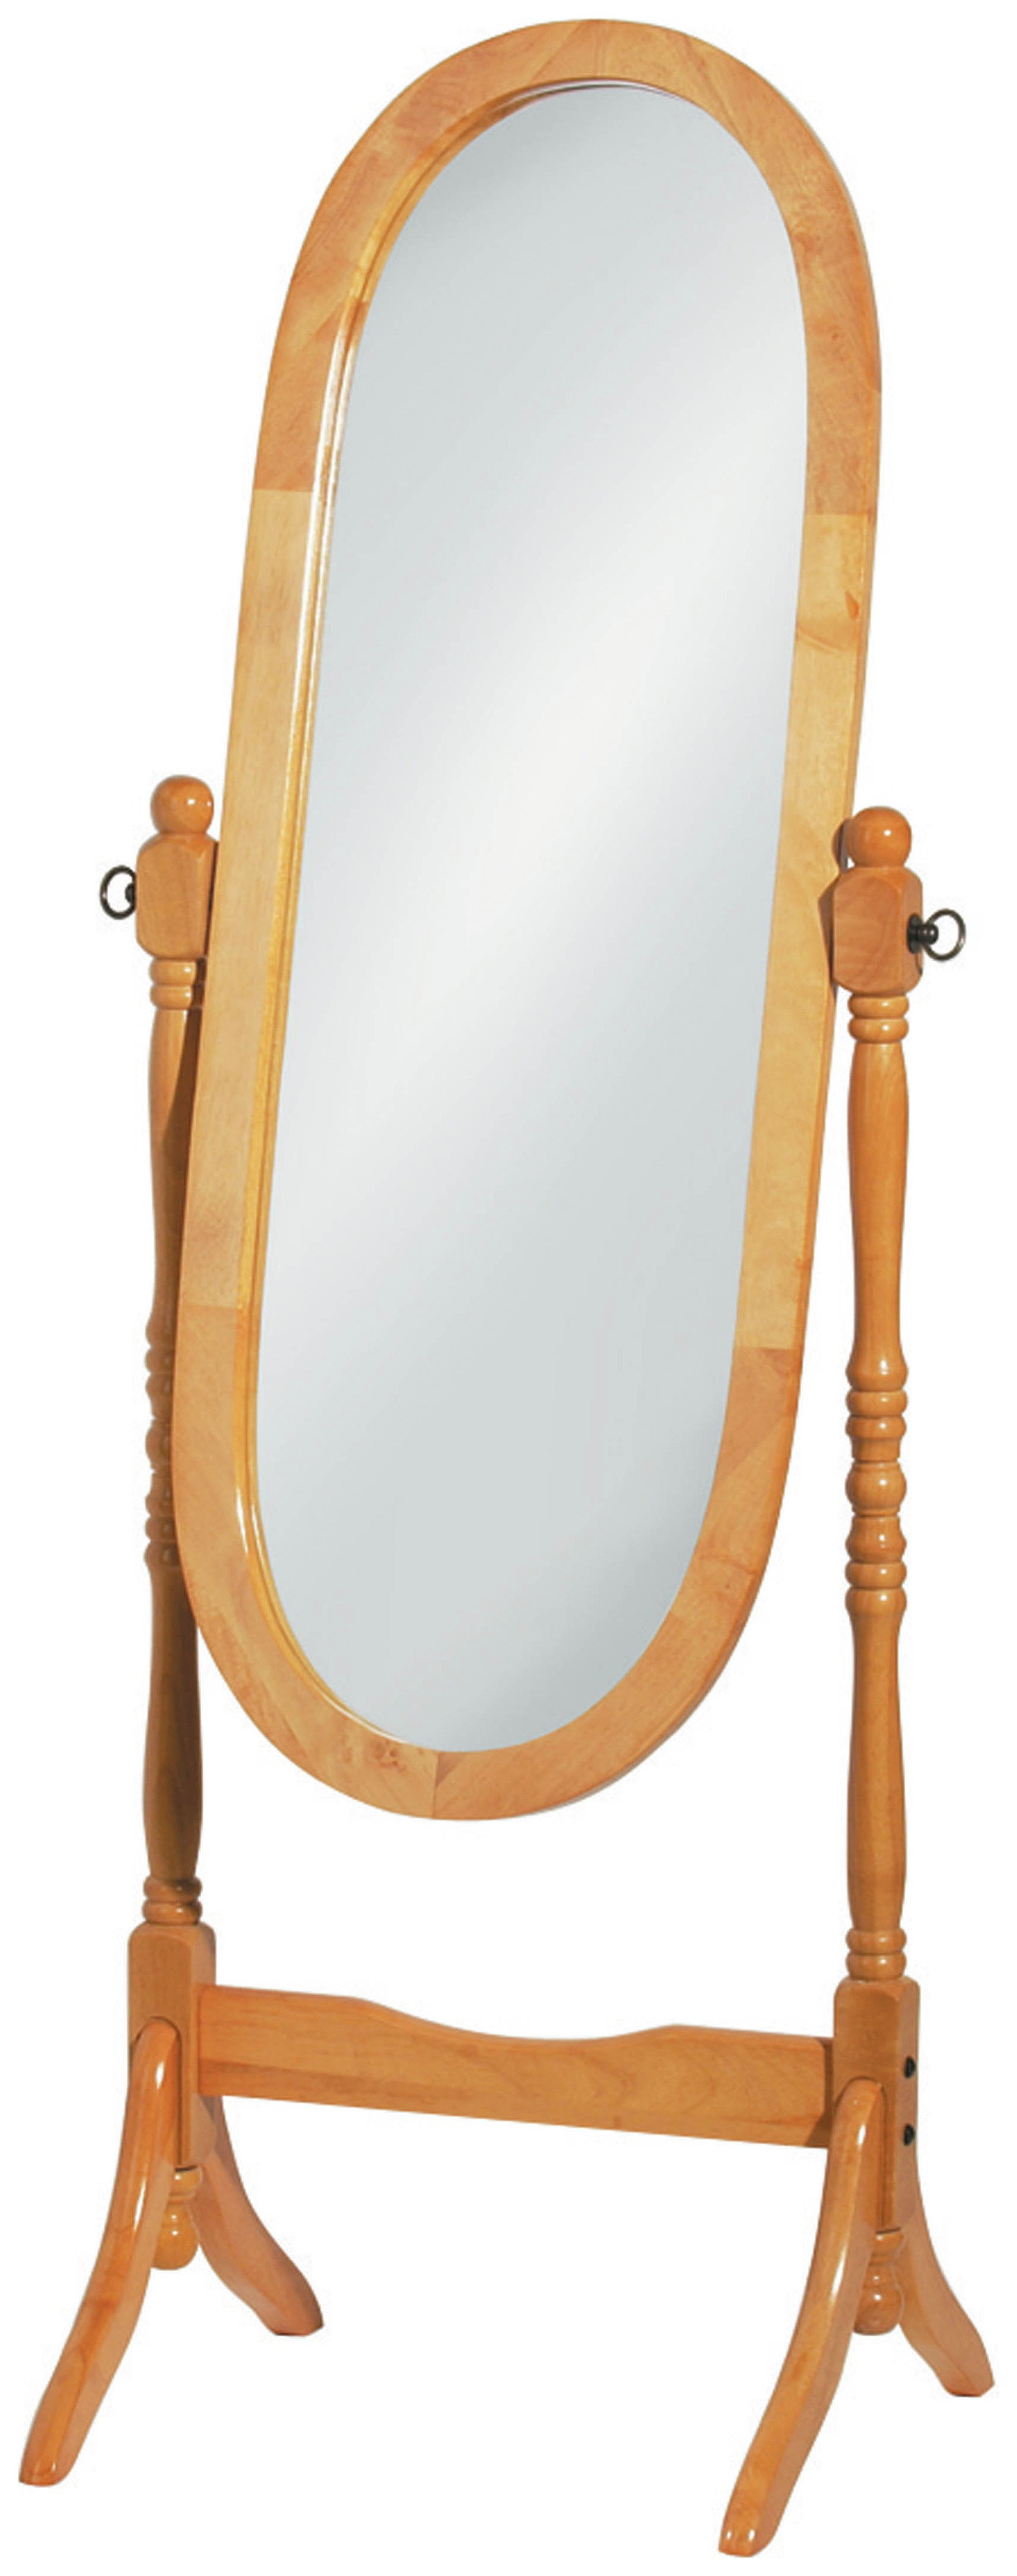 Premier Housewares Oval Wooden Frame Cheval Mirror - Oak